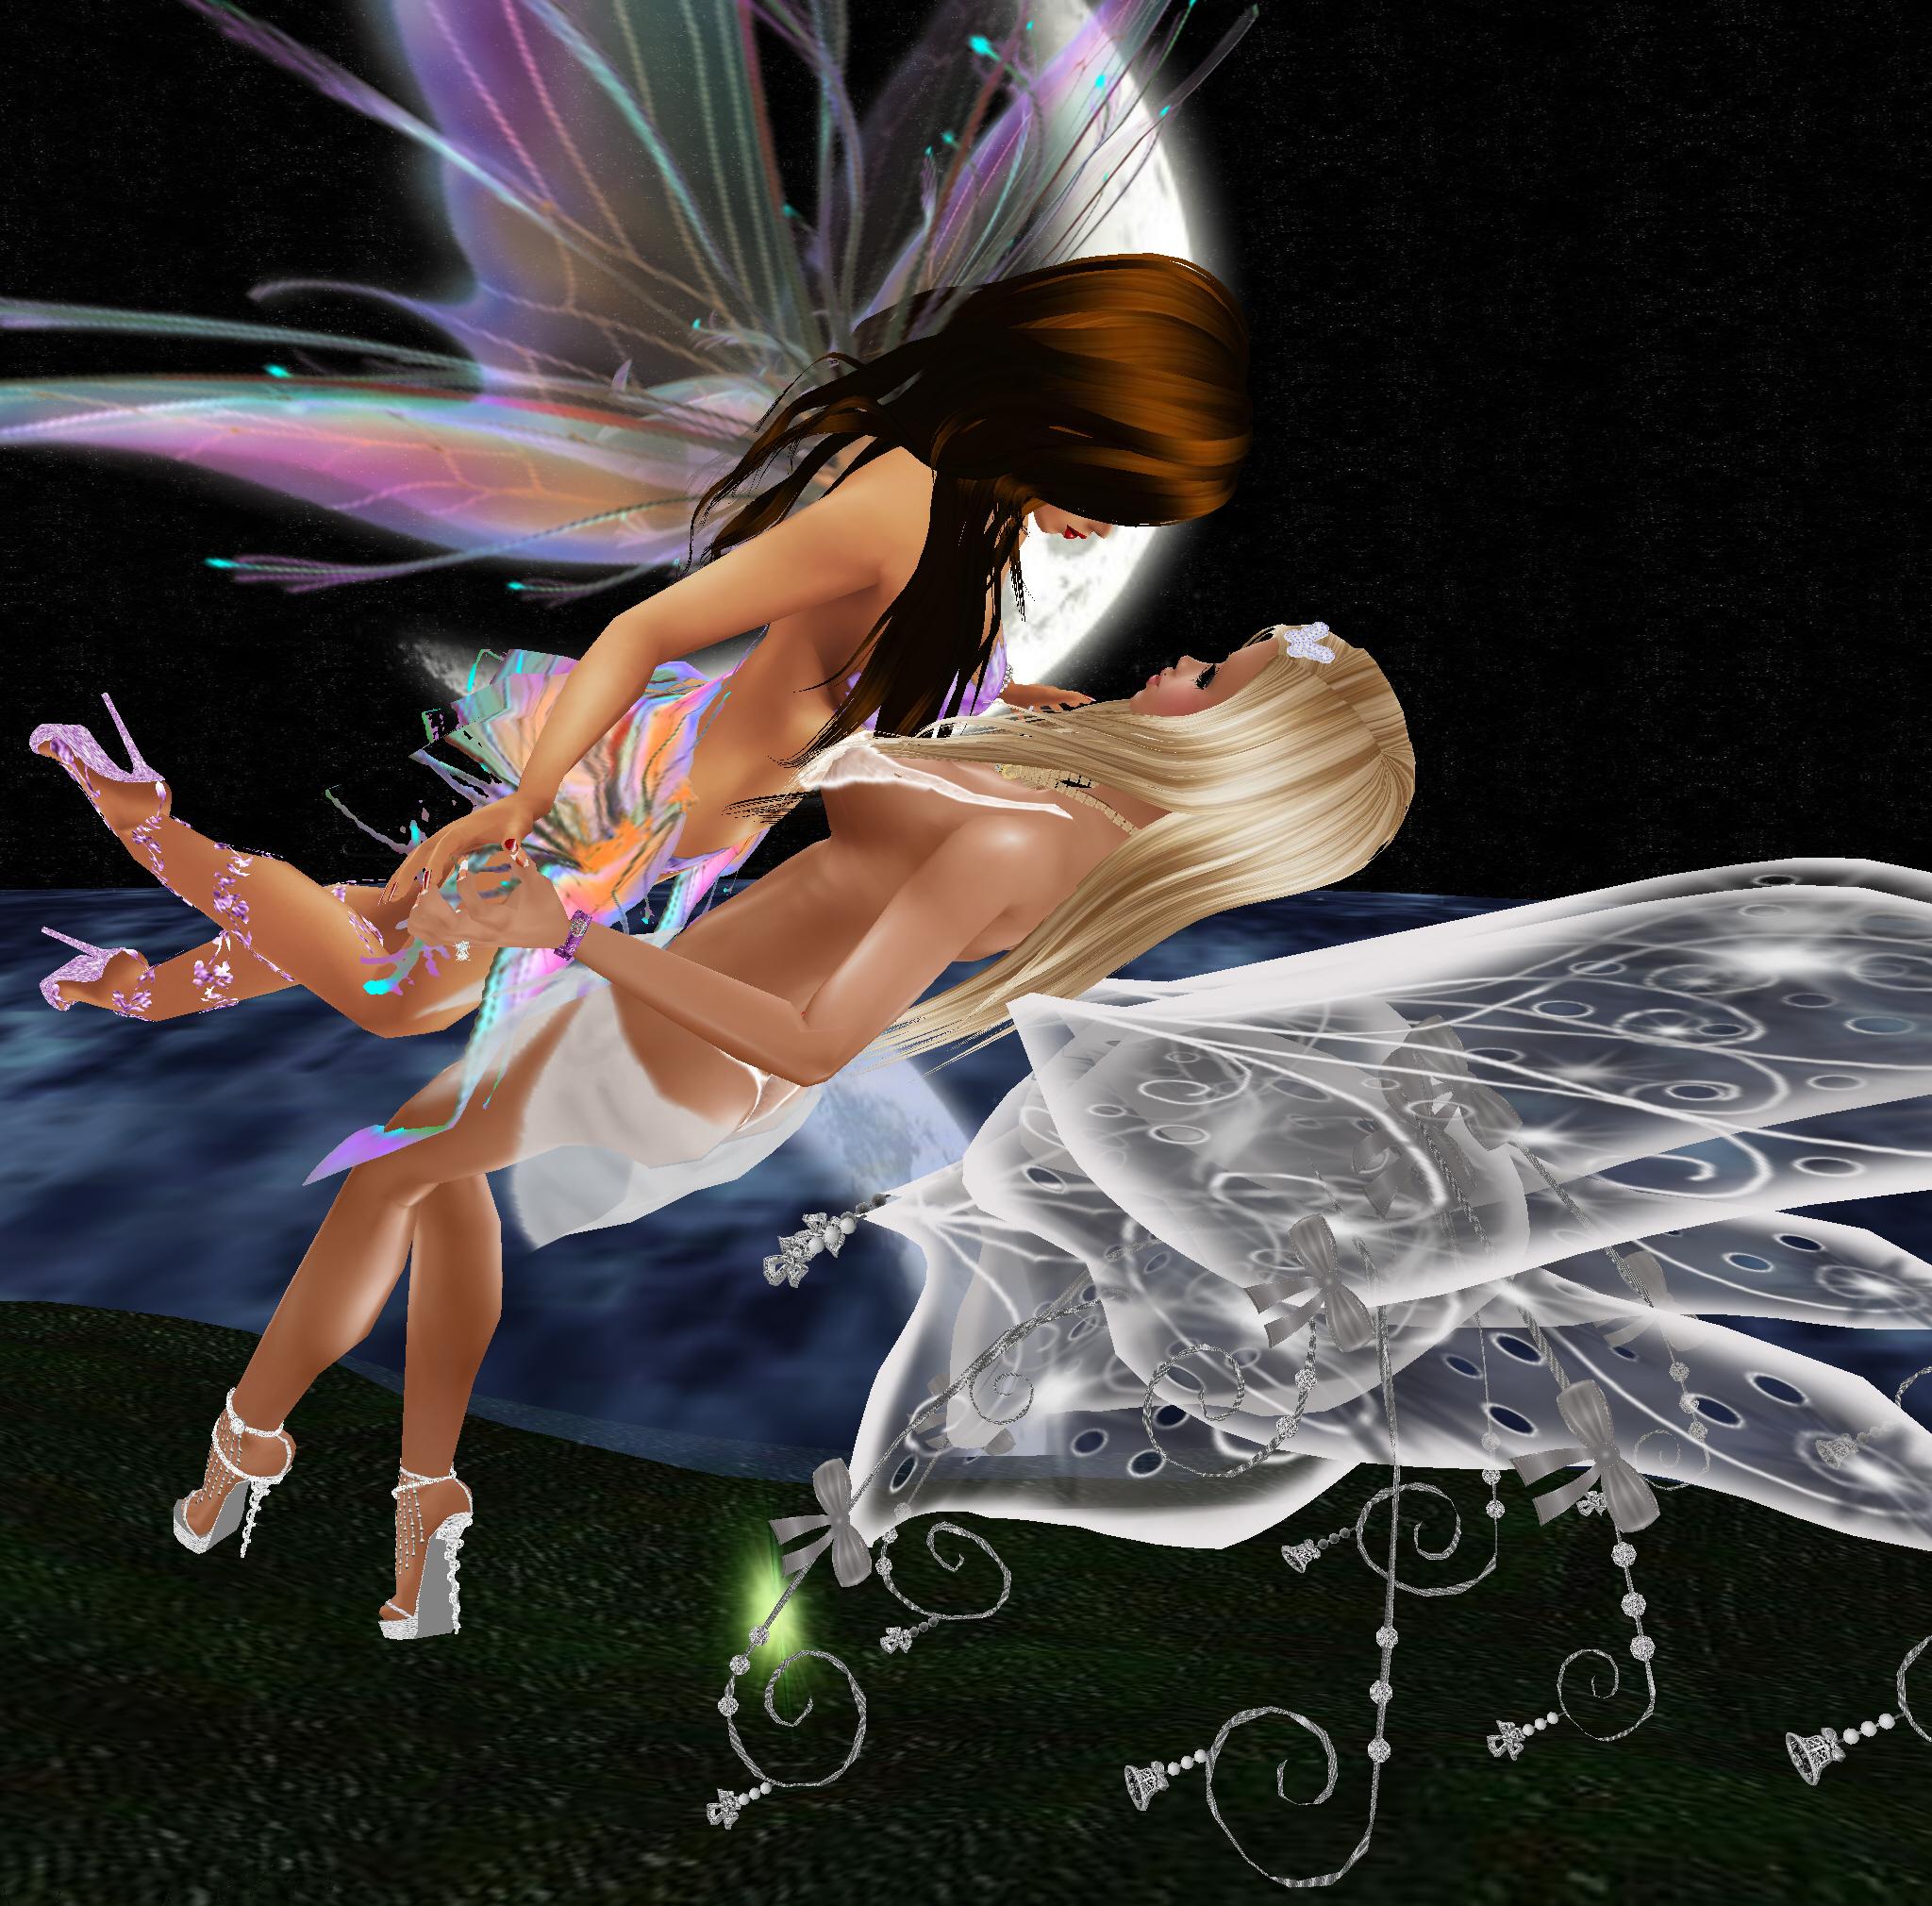 Pictures of fairies having sex